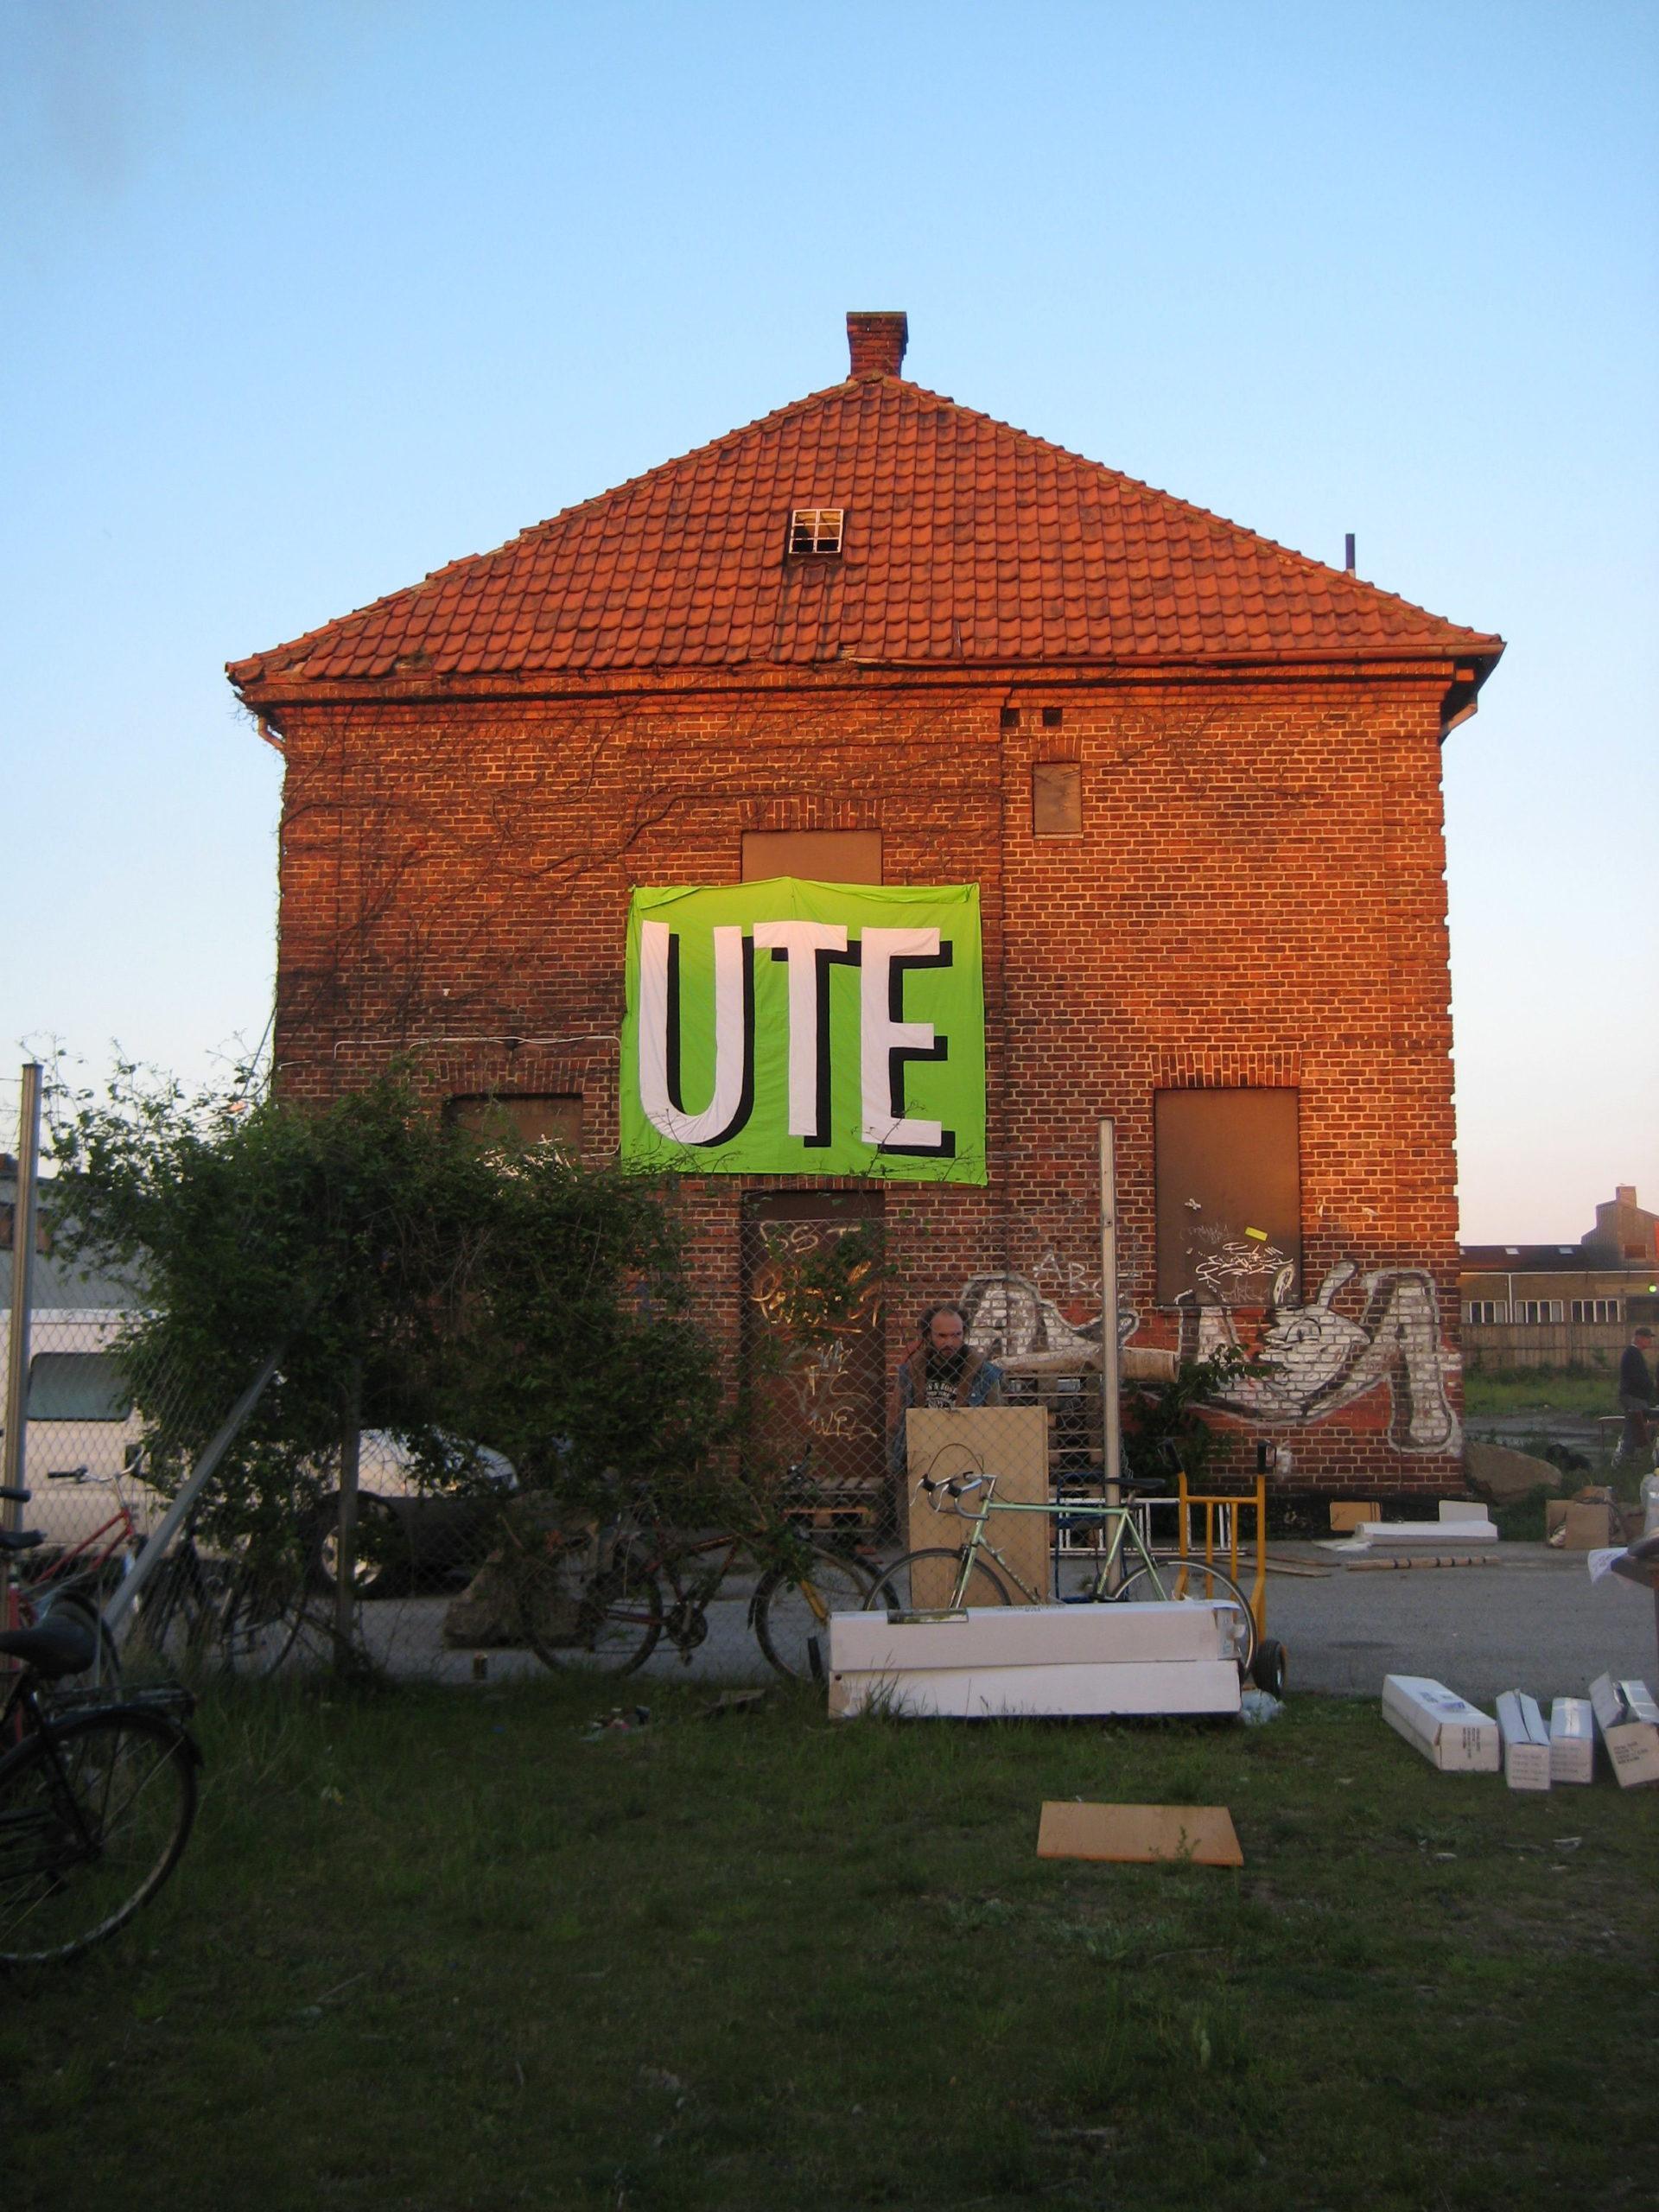 Brännaren 2, UTE, 2009